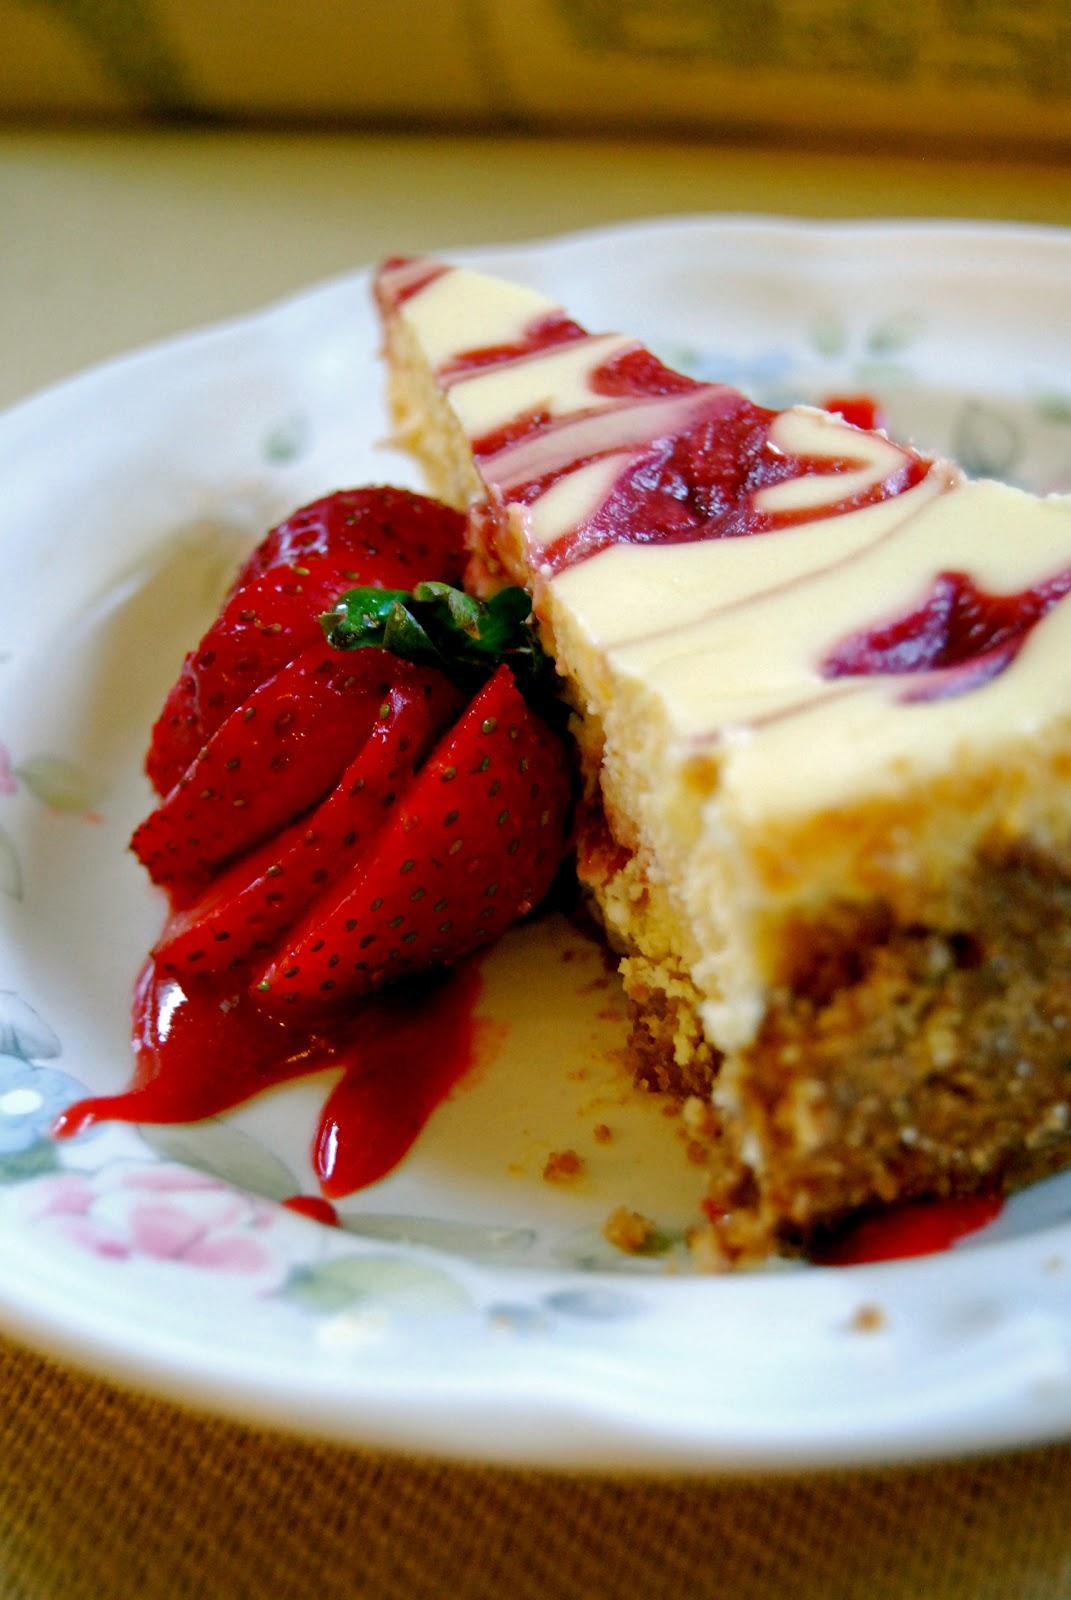 Strawberry Cheesecake | by Life Tastes Good